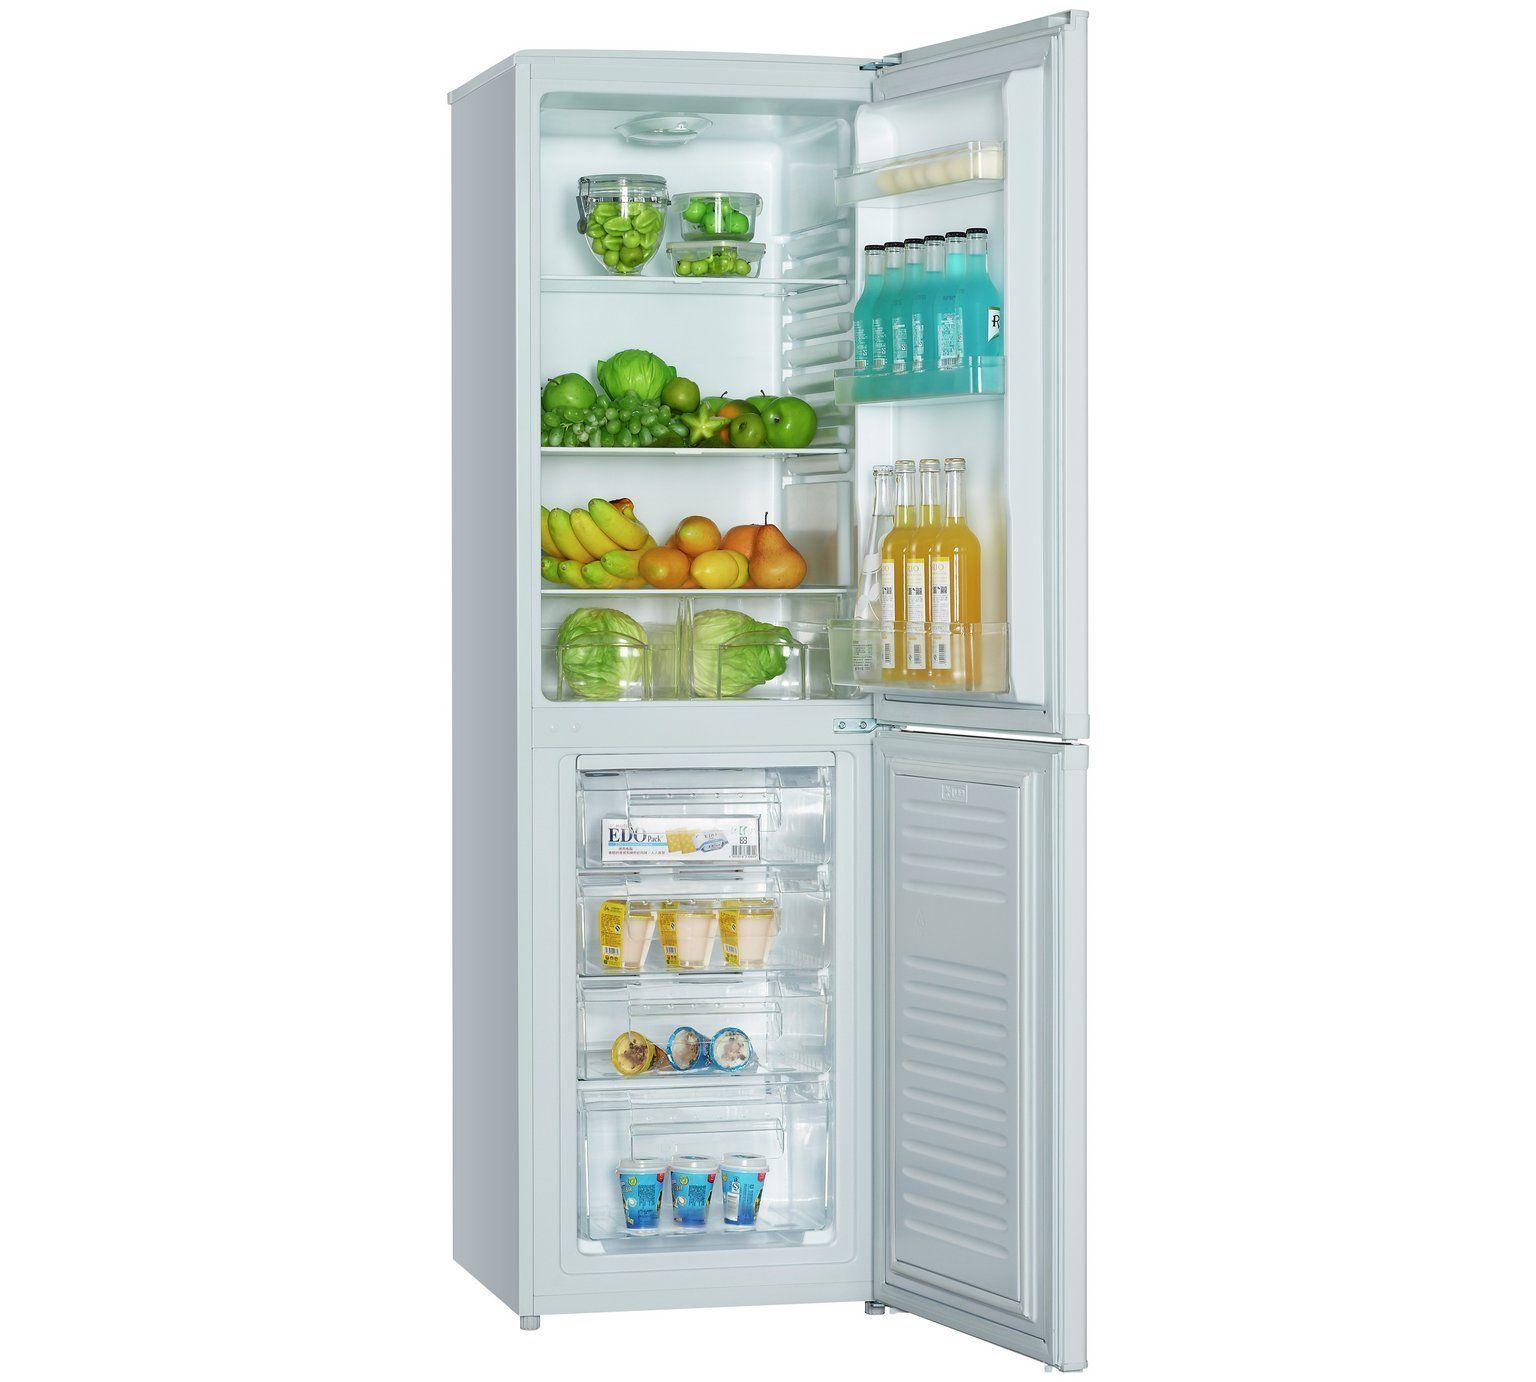 Buy Bush BFFF55174W2 Fridge Freezer - White at Argos.co.uk, visit ...